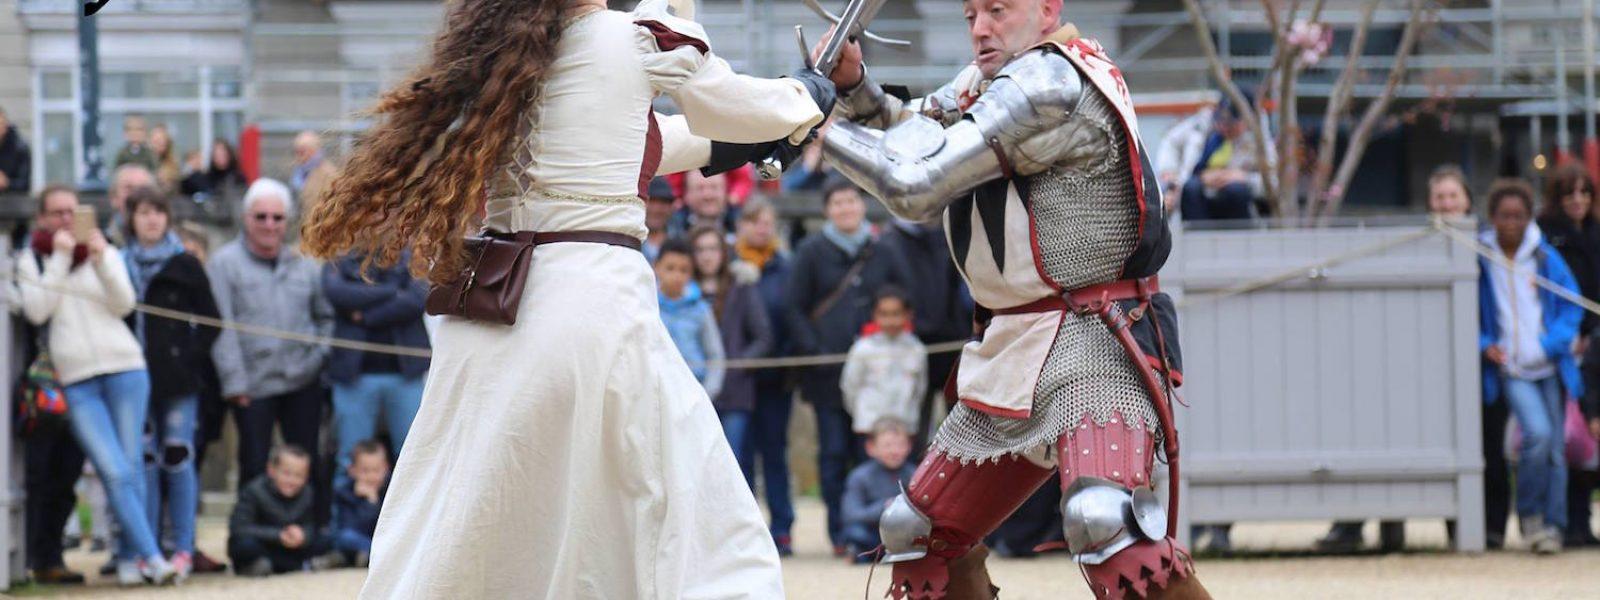 Happening médiéval dans les rues de Rennes